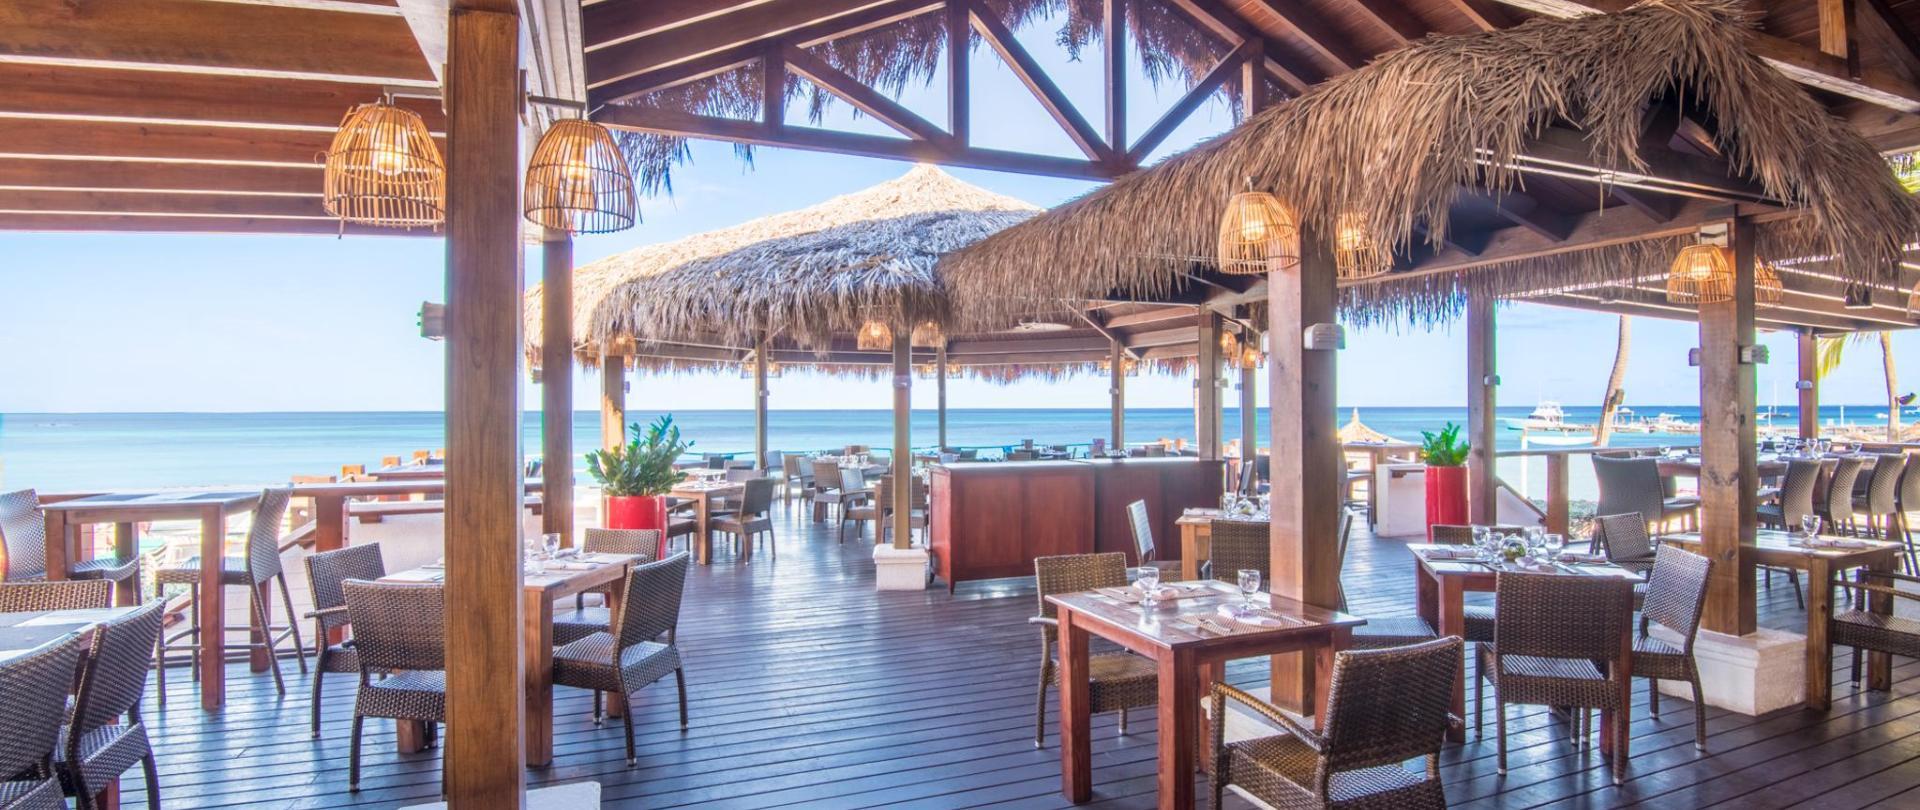 Aruba-Holiday-Inn-Sea-Breeze-Restaurant-&-Bar.jpg